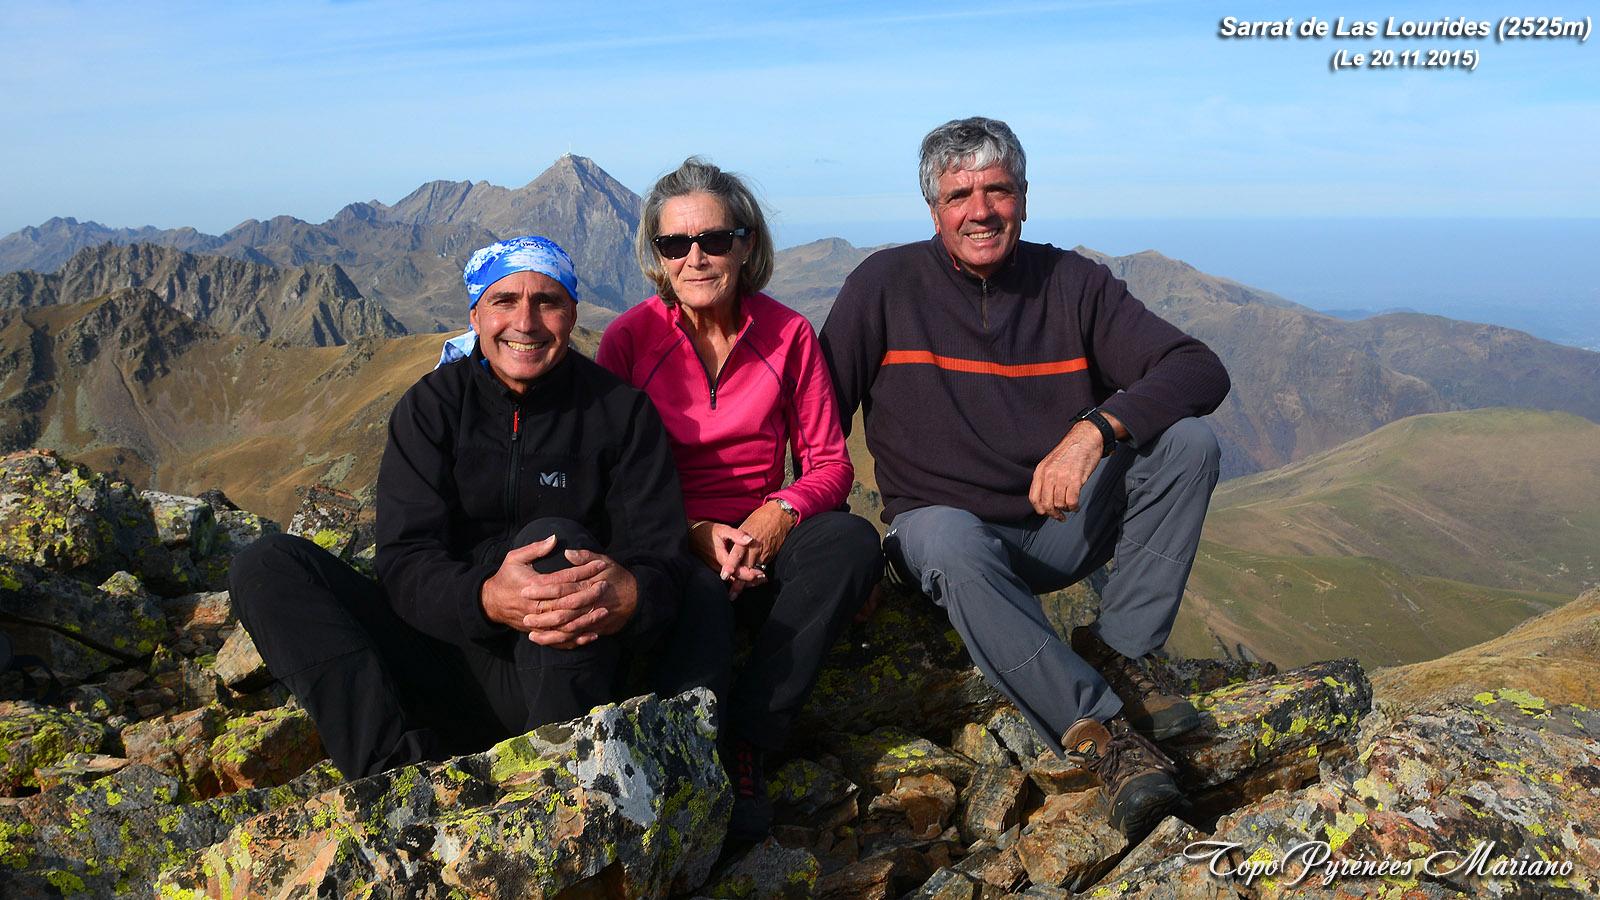 Randonnée Sarrat de Las Lourides (2518m)